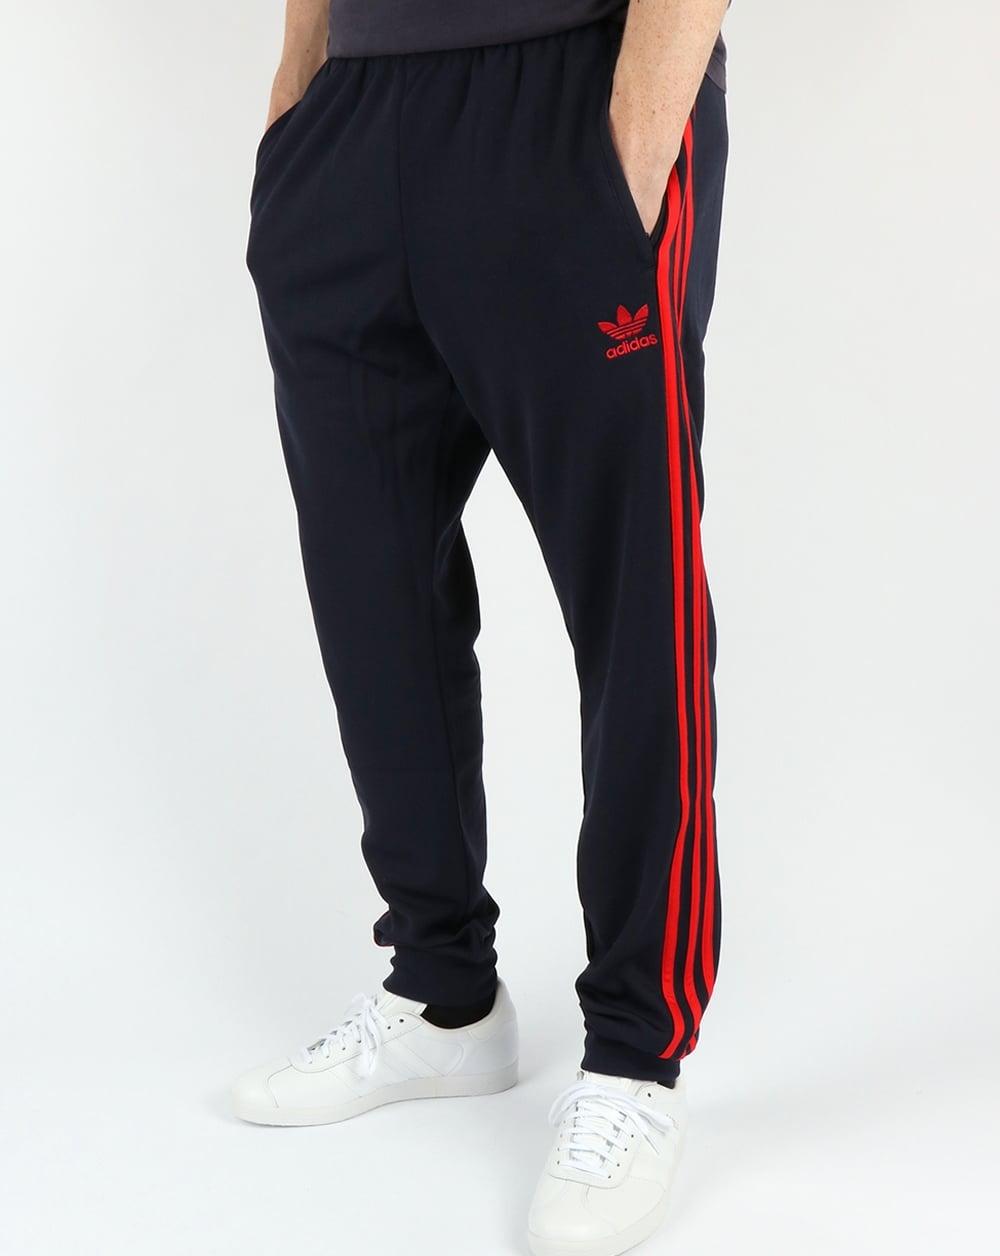 adidas originals superstar cuffed track pants navy red tracksuit bottoms. Black Bedroom Furniture Sets. Home Design Ideas